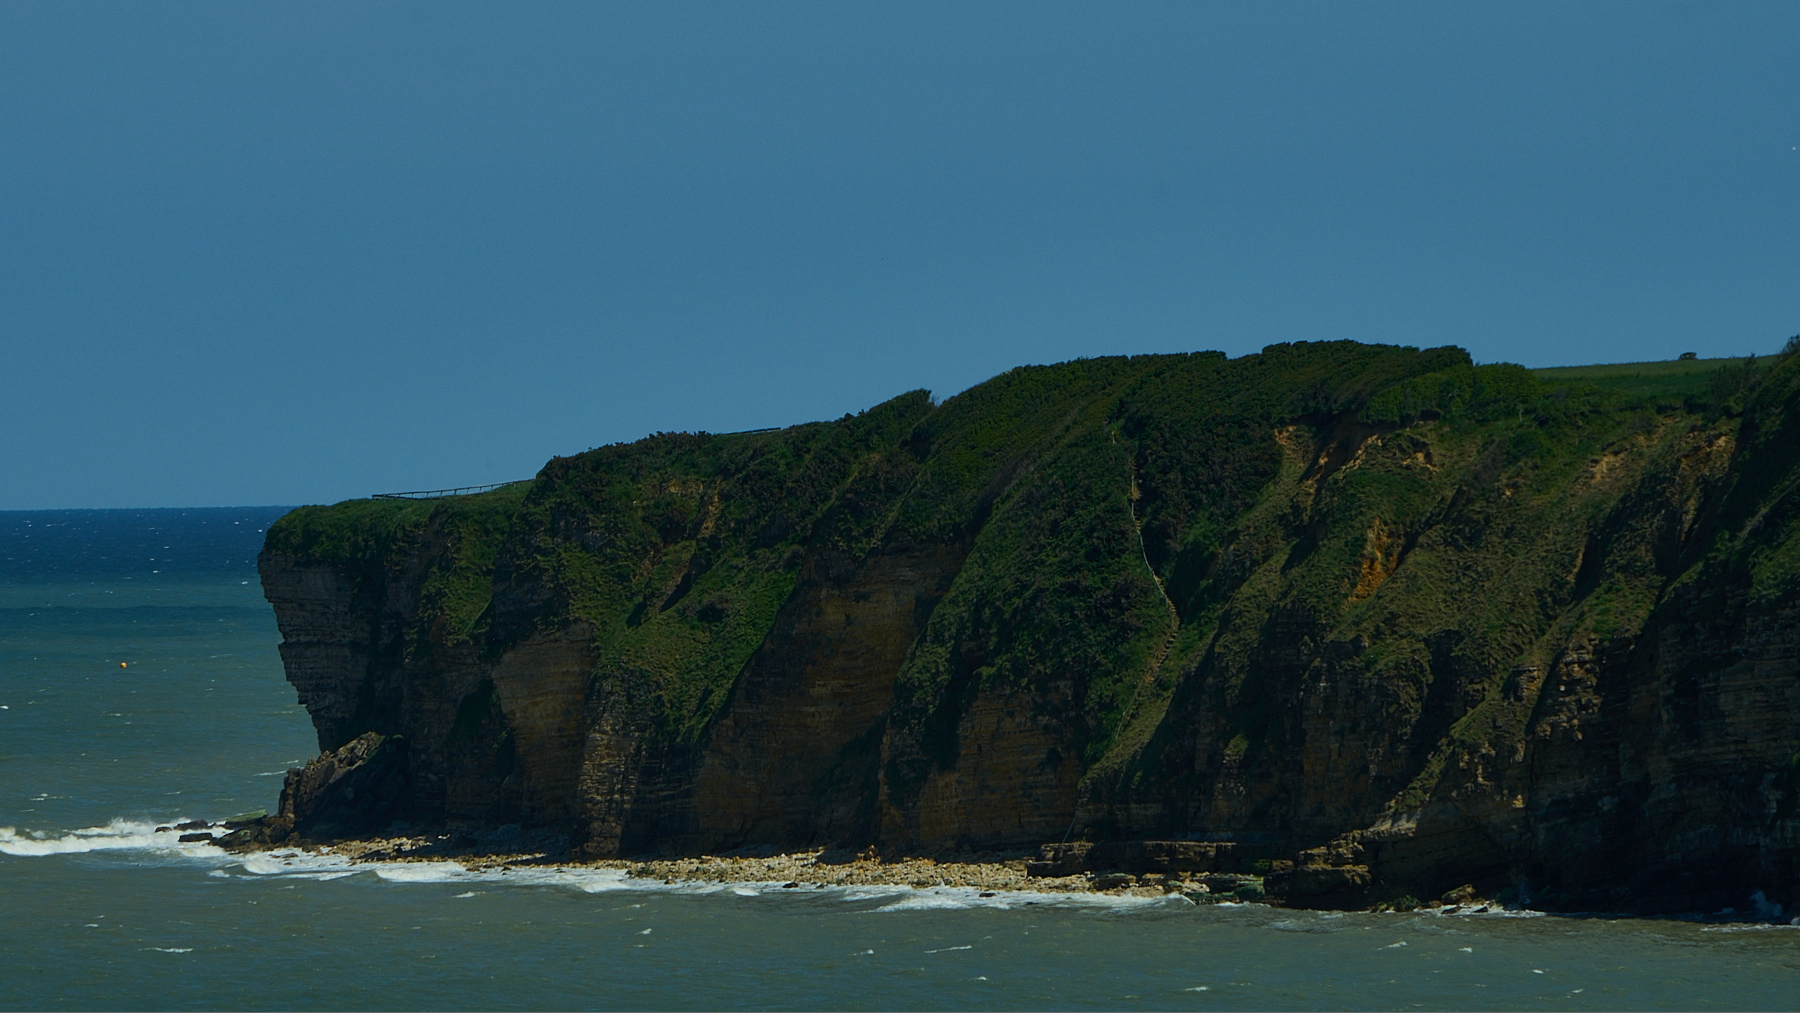 Omaha Beach Cliffs